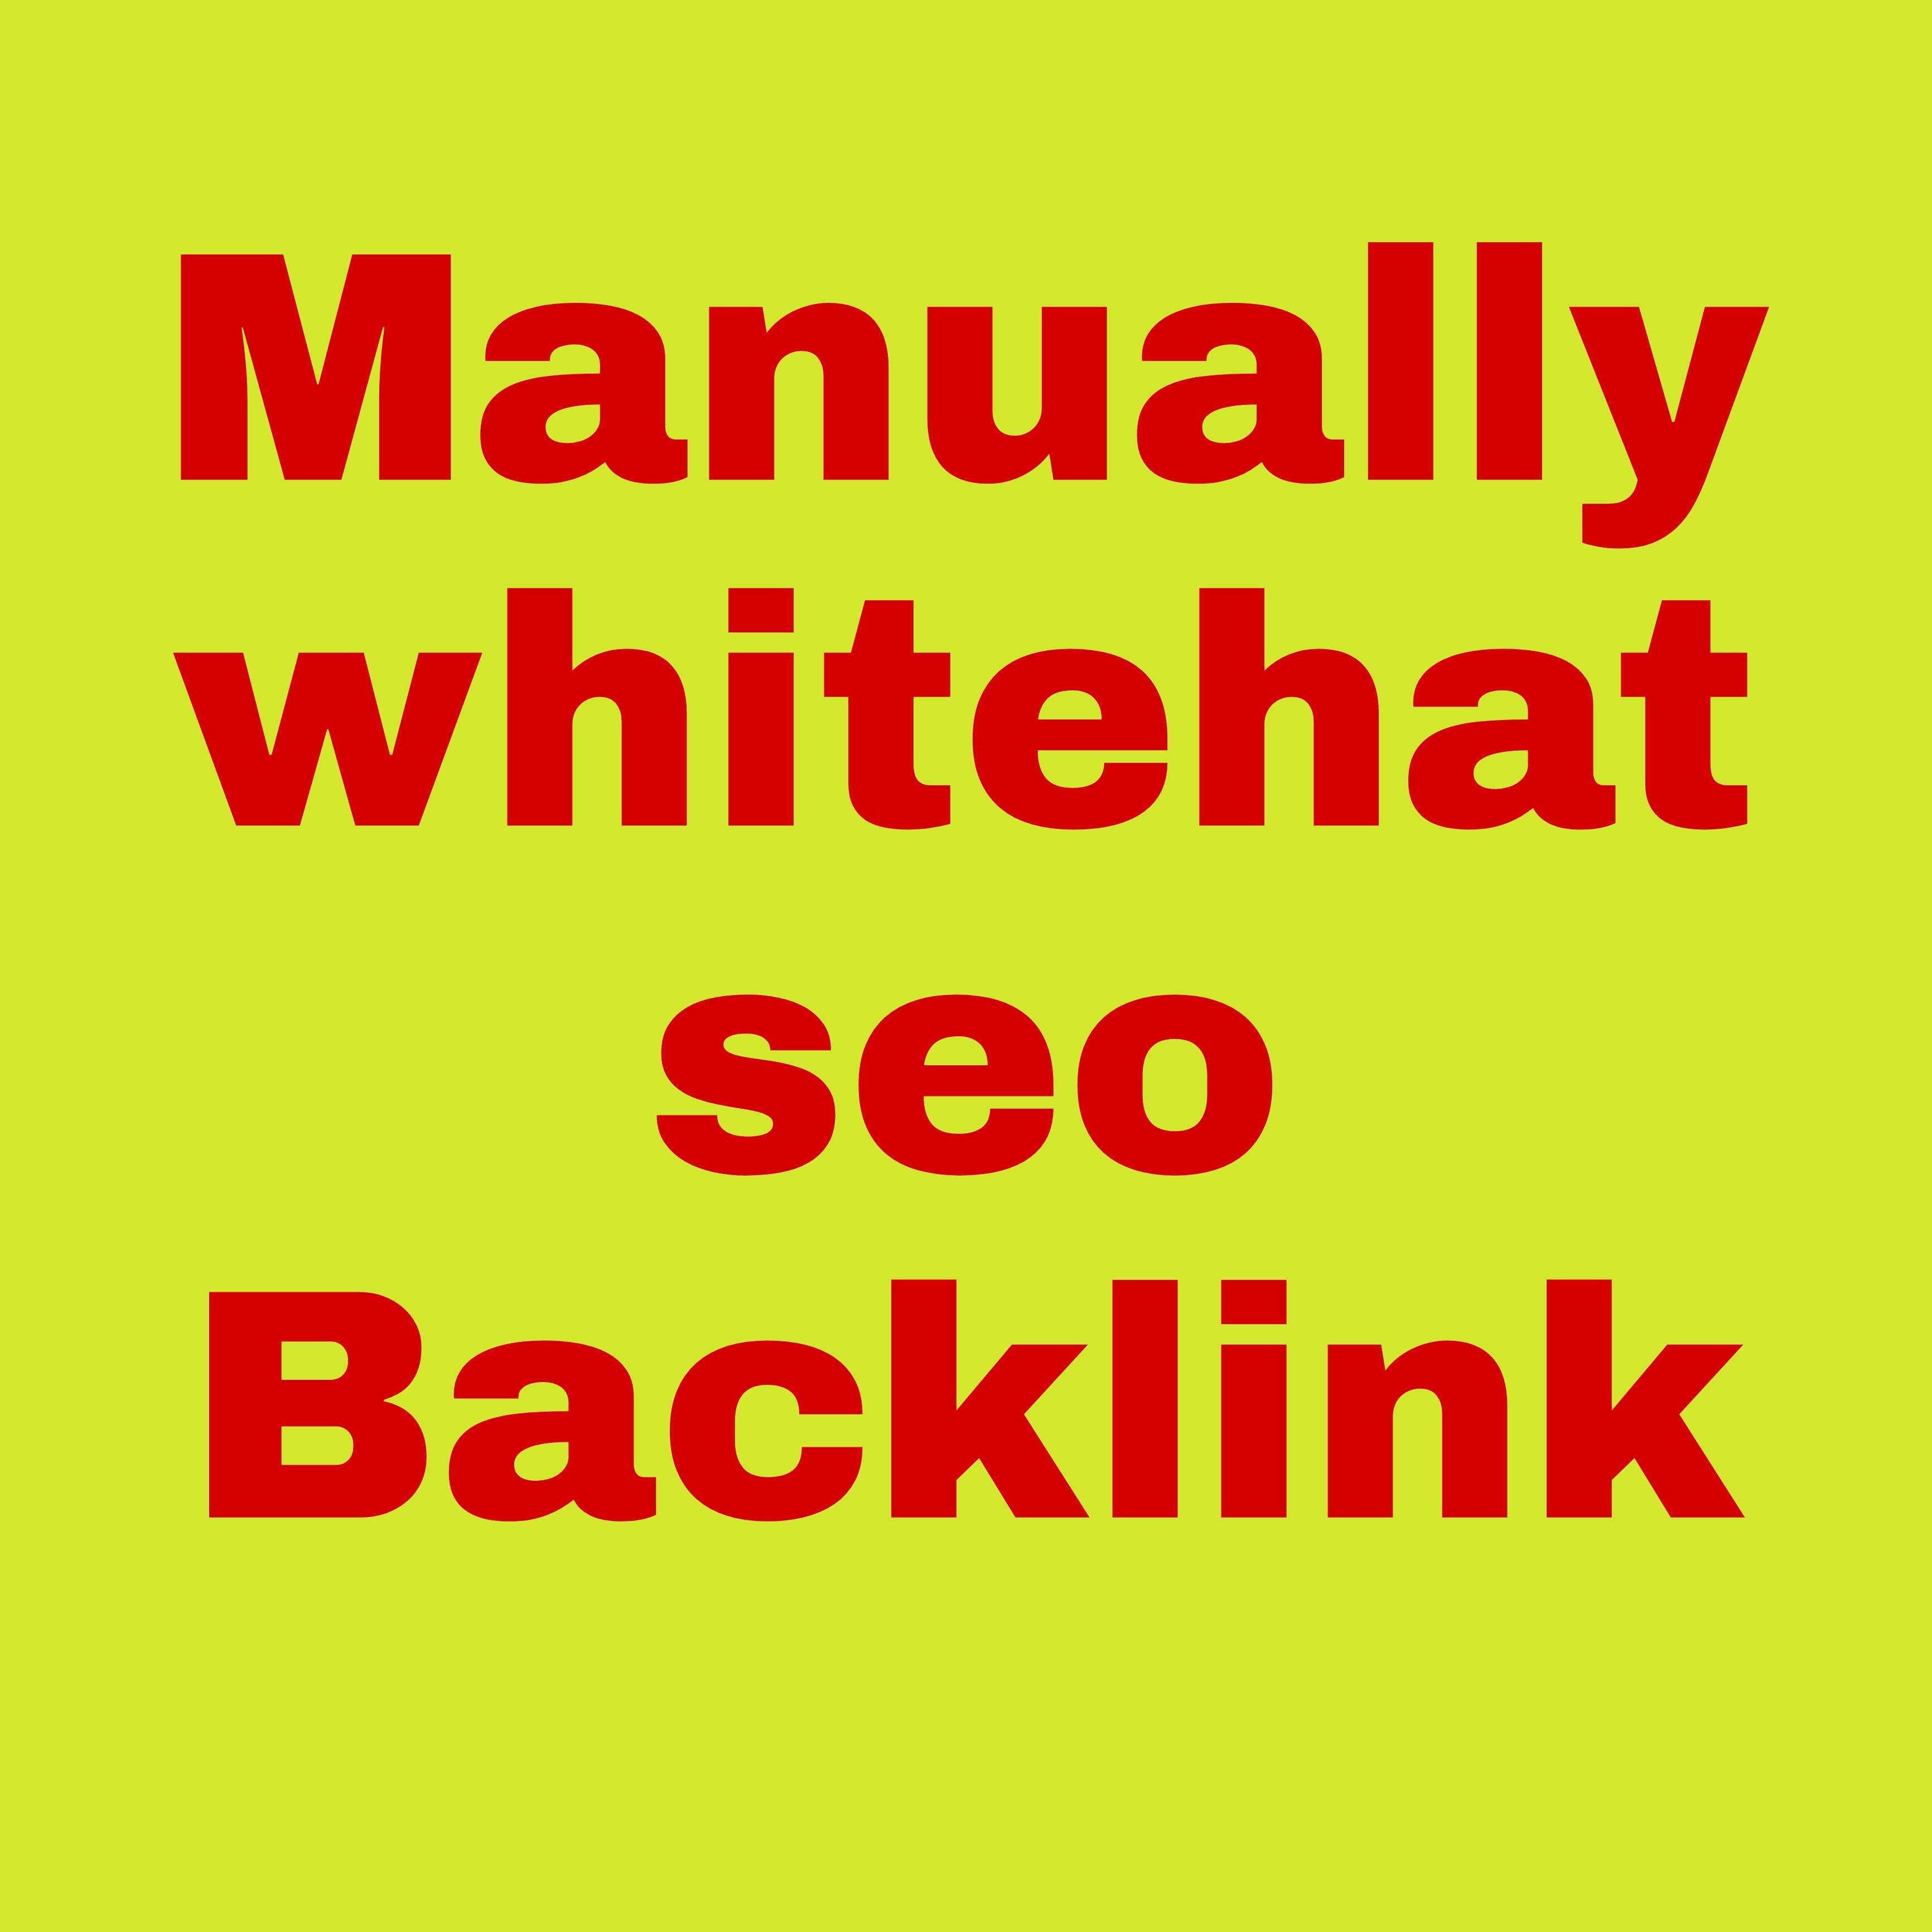 100+ Manually Whitehat Authority Backlinks For Google Ranking